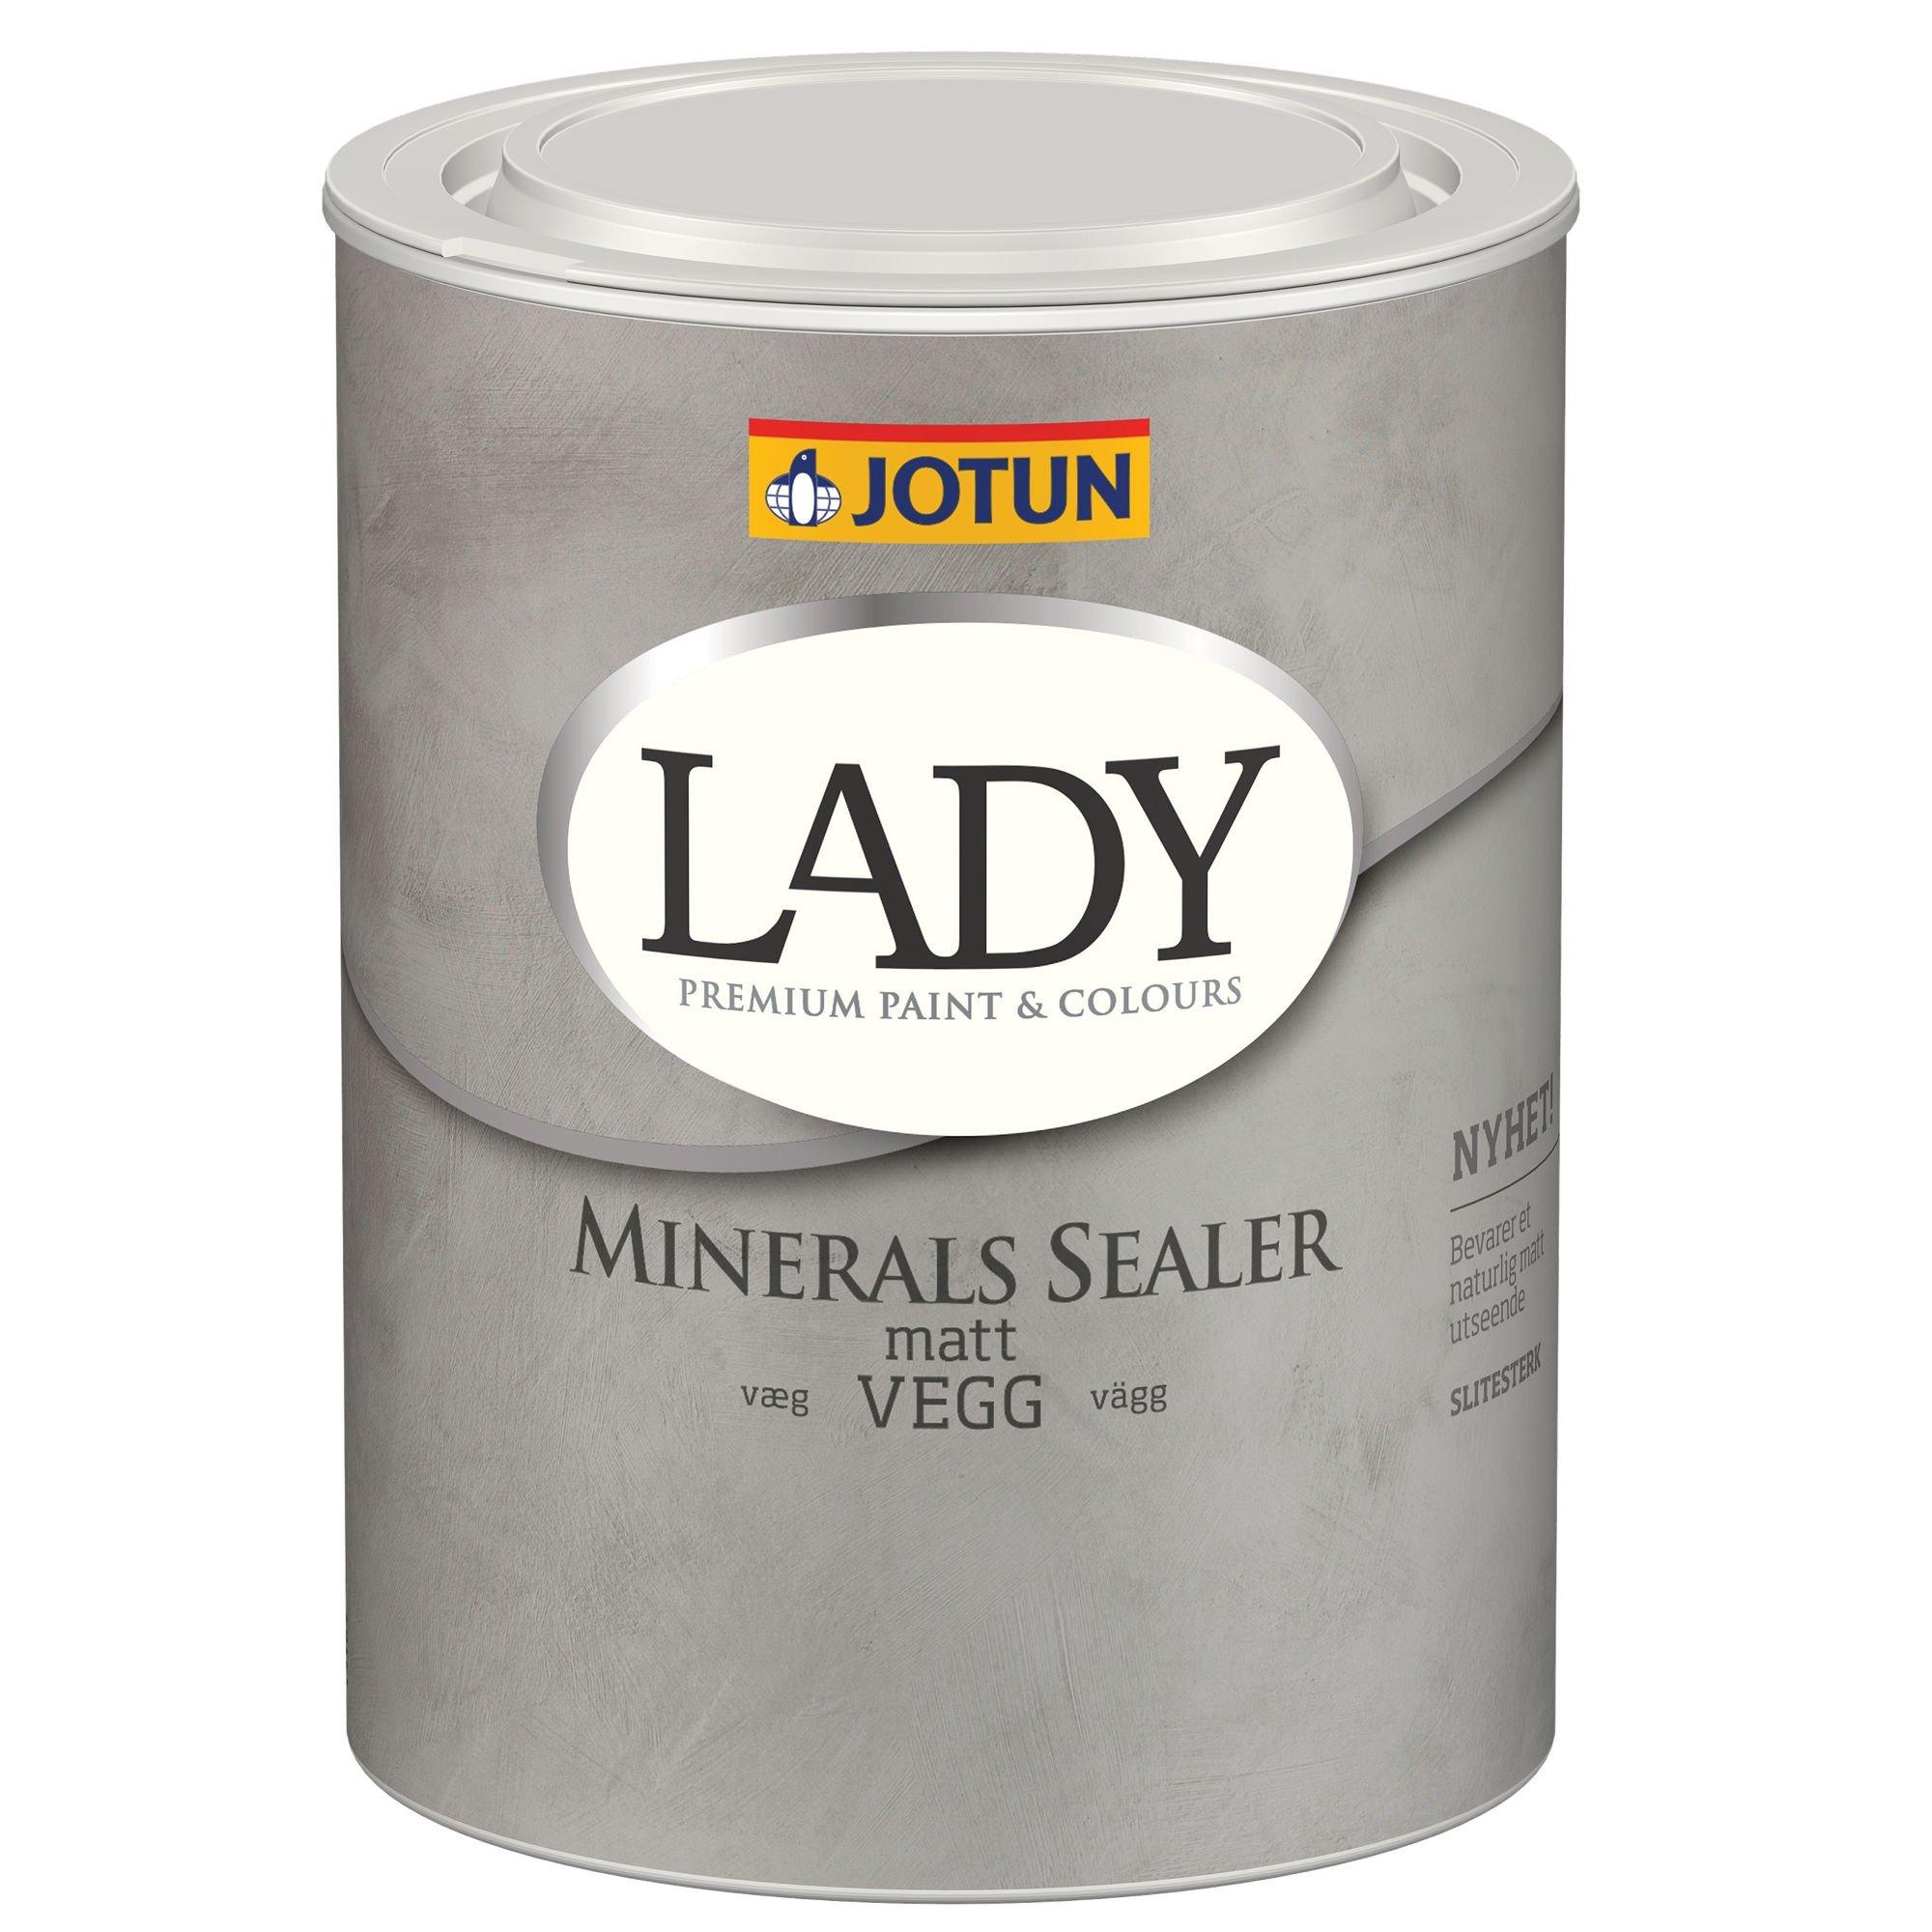 LADY Minerals Sealer